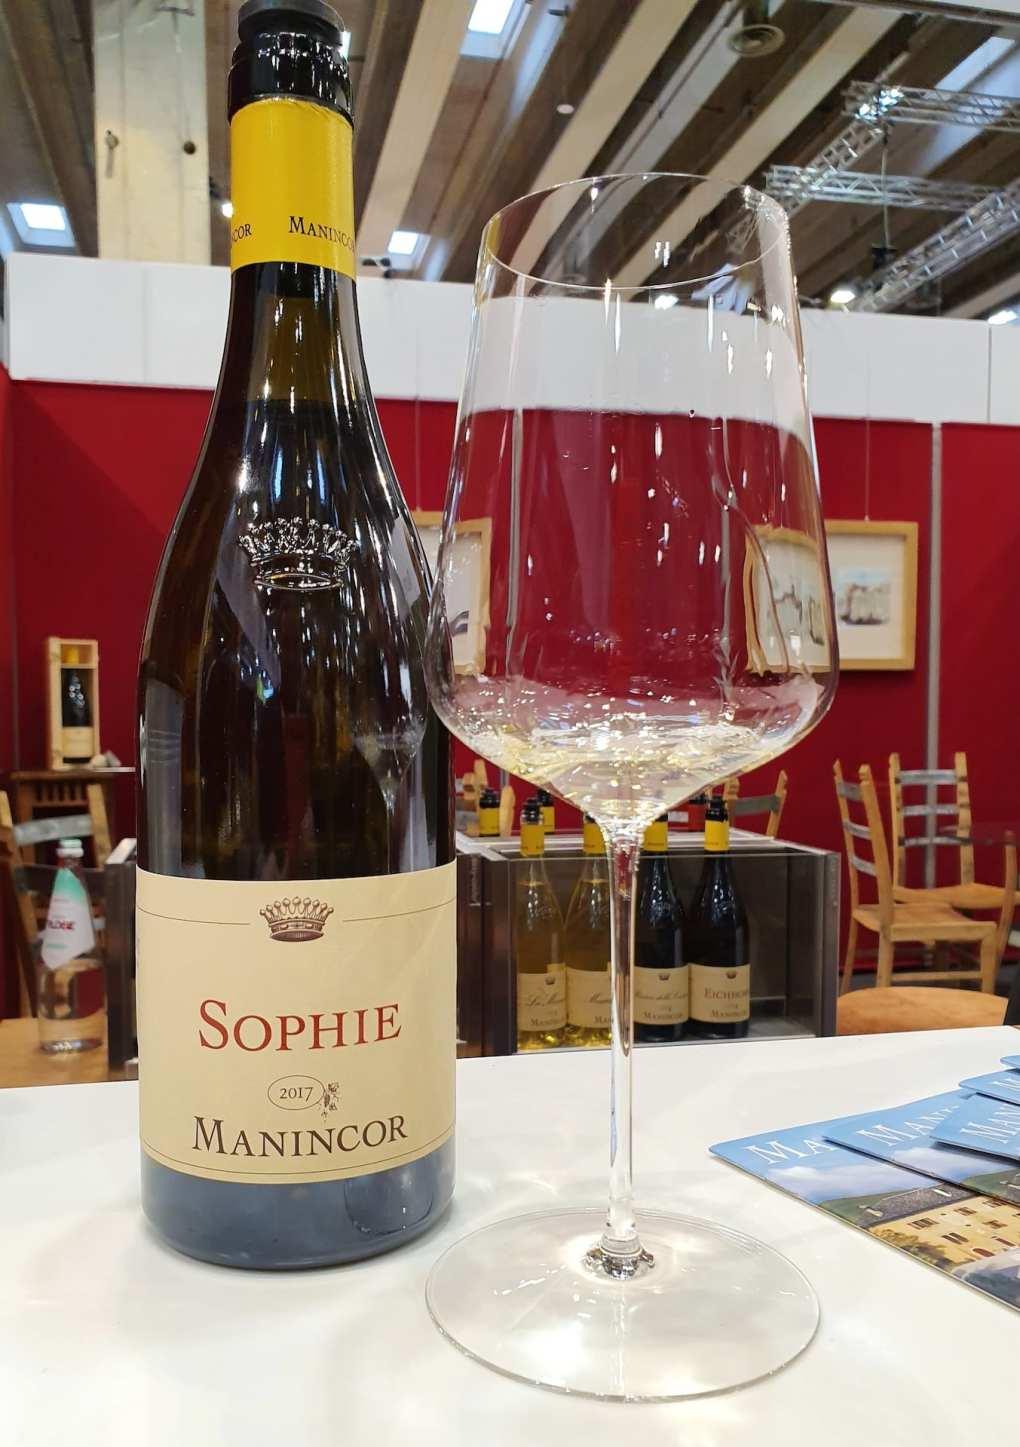 Manincor Sophie 2017 al Vinitaly 2019